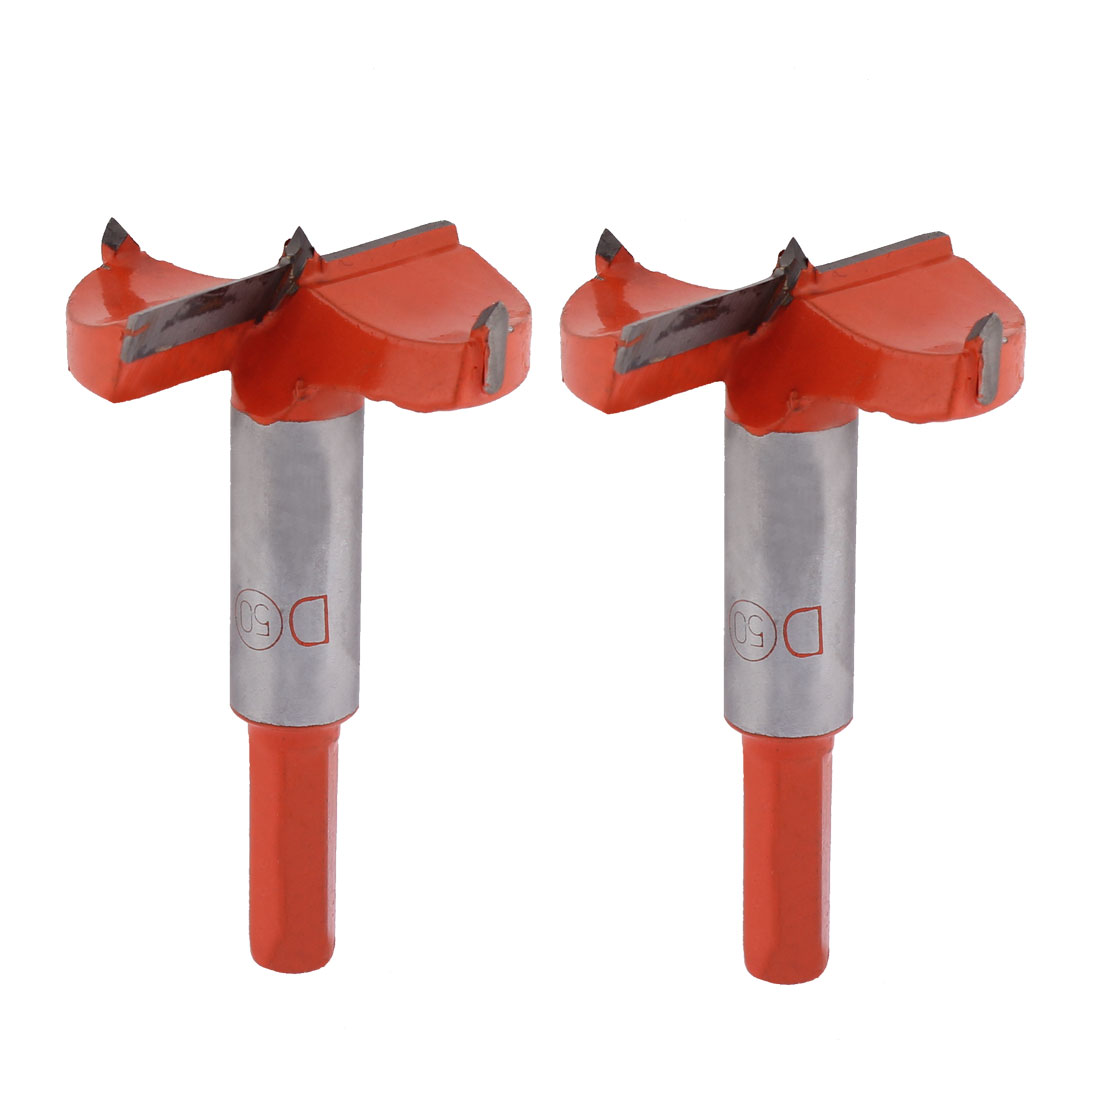 Carpenter Woodworking 50mm Cutting Dia Drilling Carbide Tip Hinge Boring Bit 2pcs